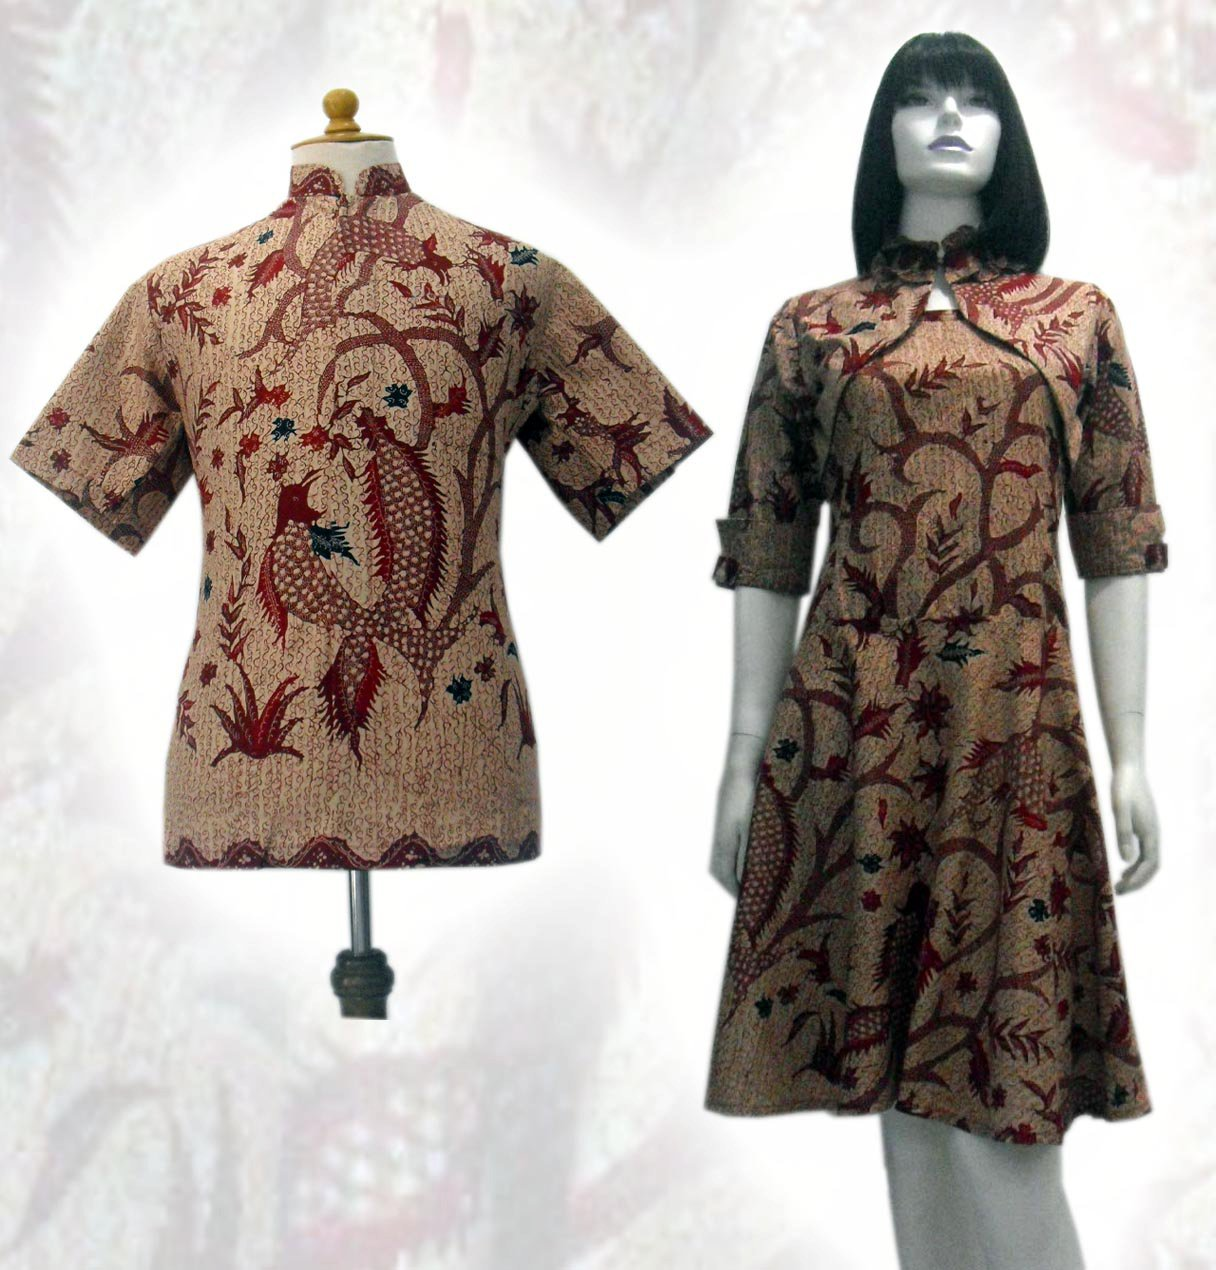 Model Baju Batik Wanita 2015: BAJU BATIK PEKALONGAN MODERN TERBARU 2014: MODEL BAJU